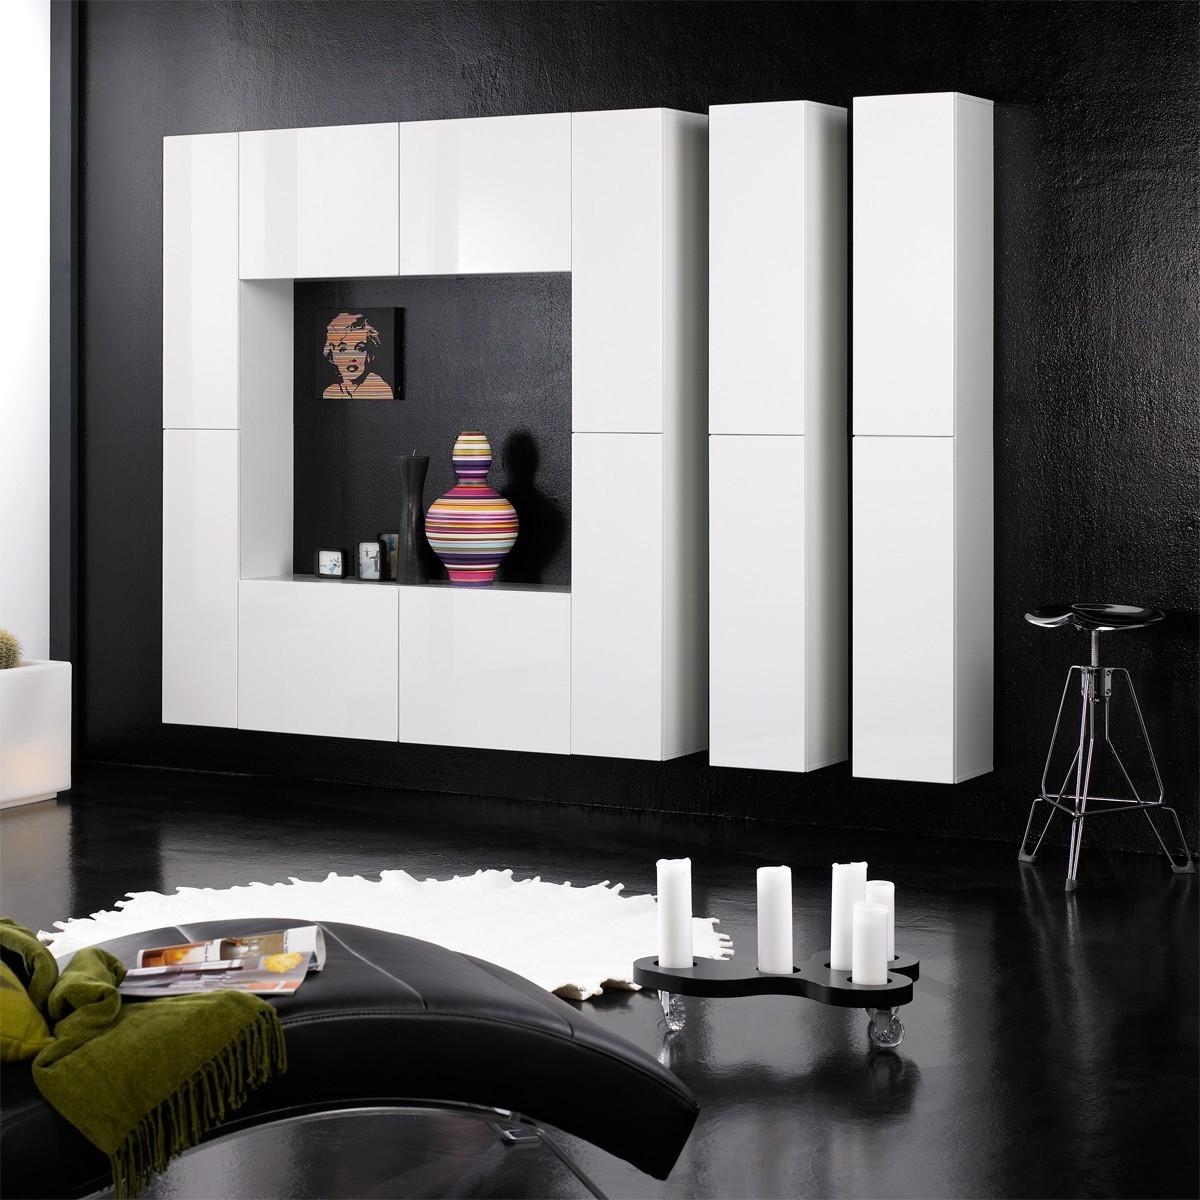 wohnzimmer regalwand system. Black Bedroom Furniture Sets. Home Design Ideas